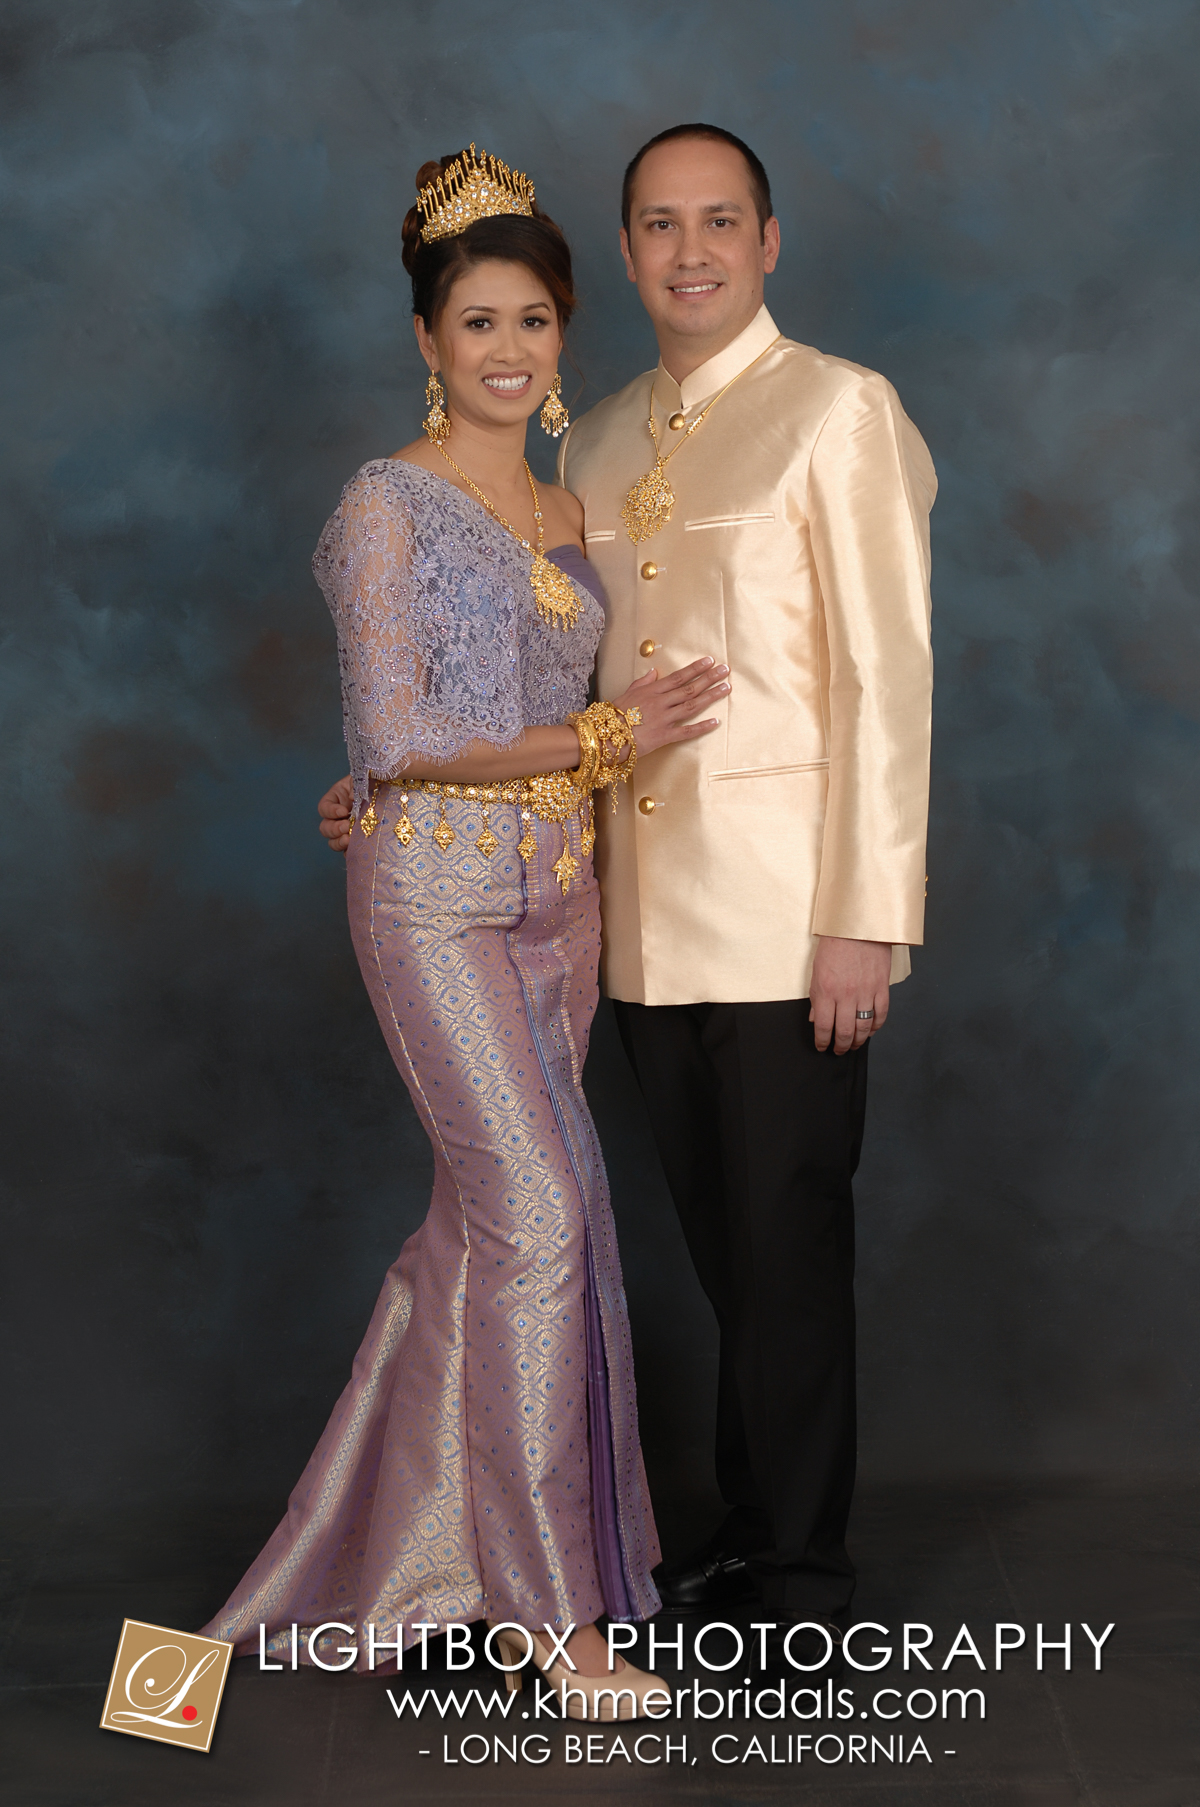 Apsara Khmer Bridal Wedding Photography and video-209.jpg